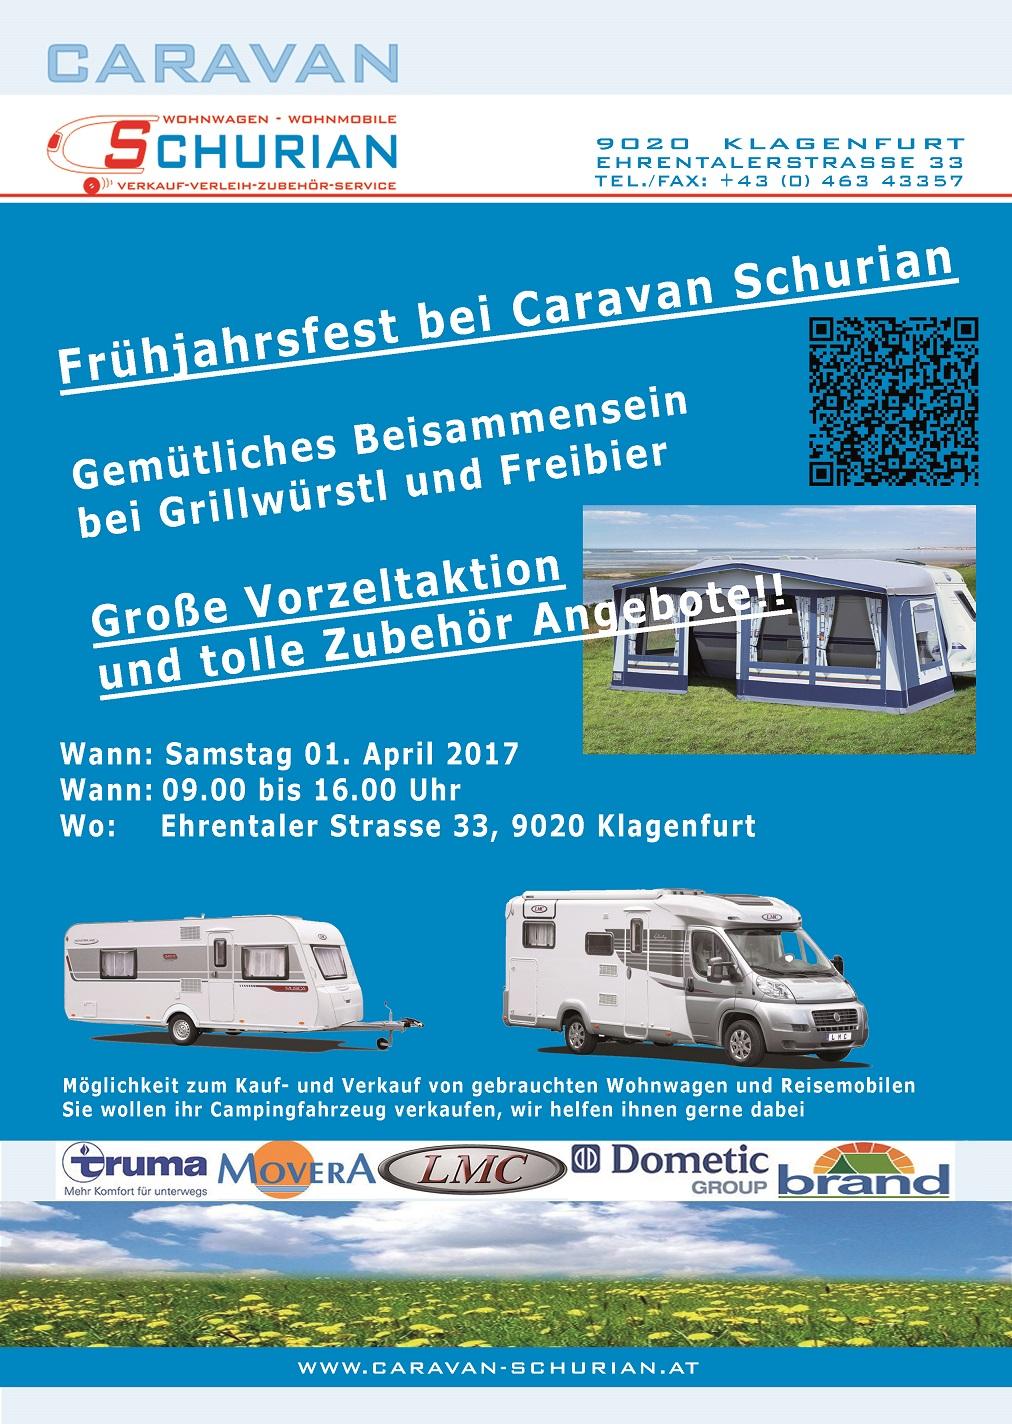 Frühlingsfest bei Caravan Schurian in Klagenfurt am Wörthersee